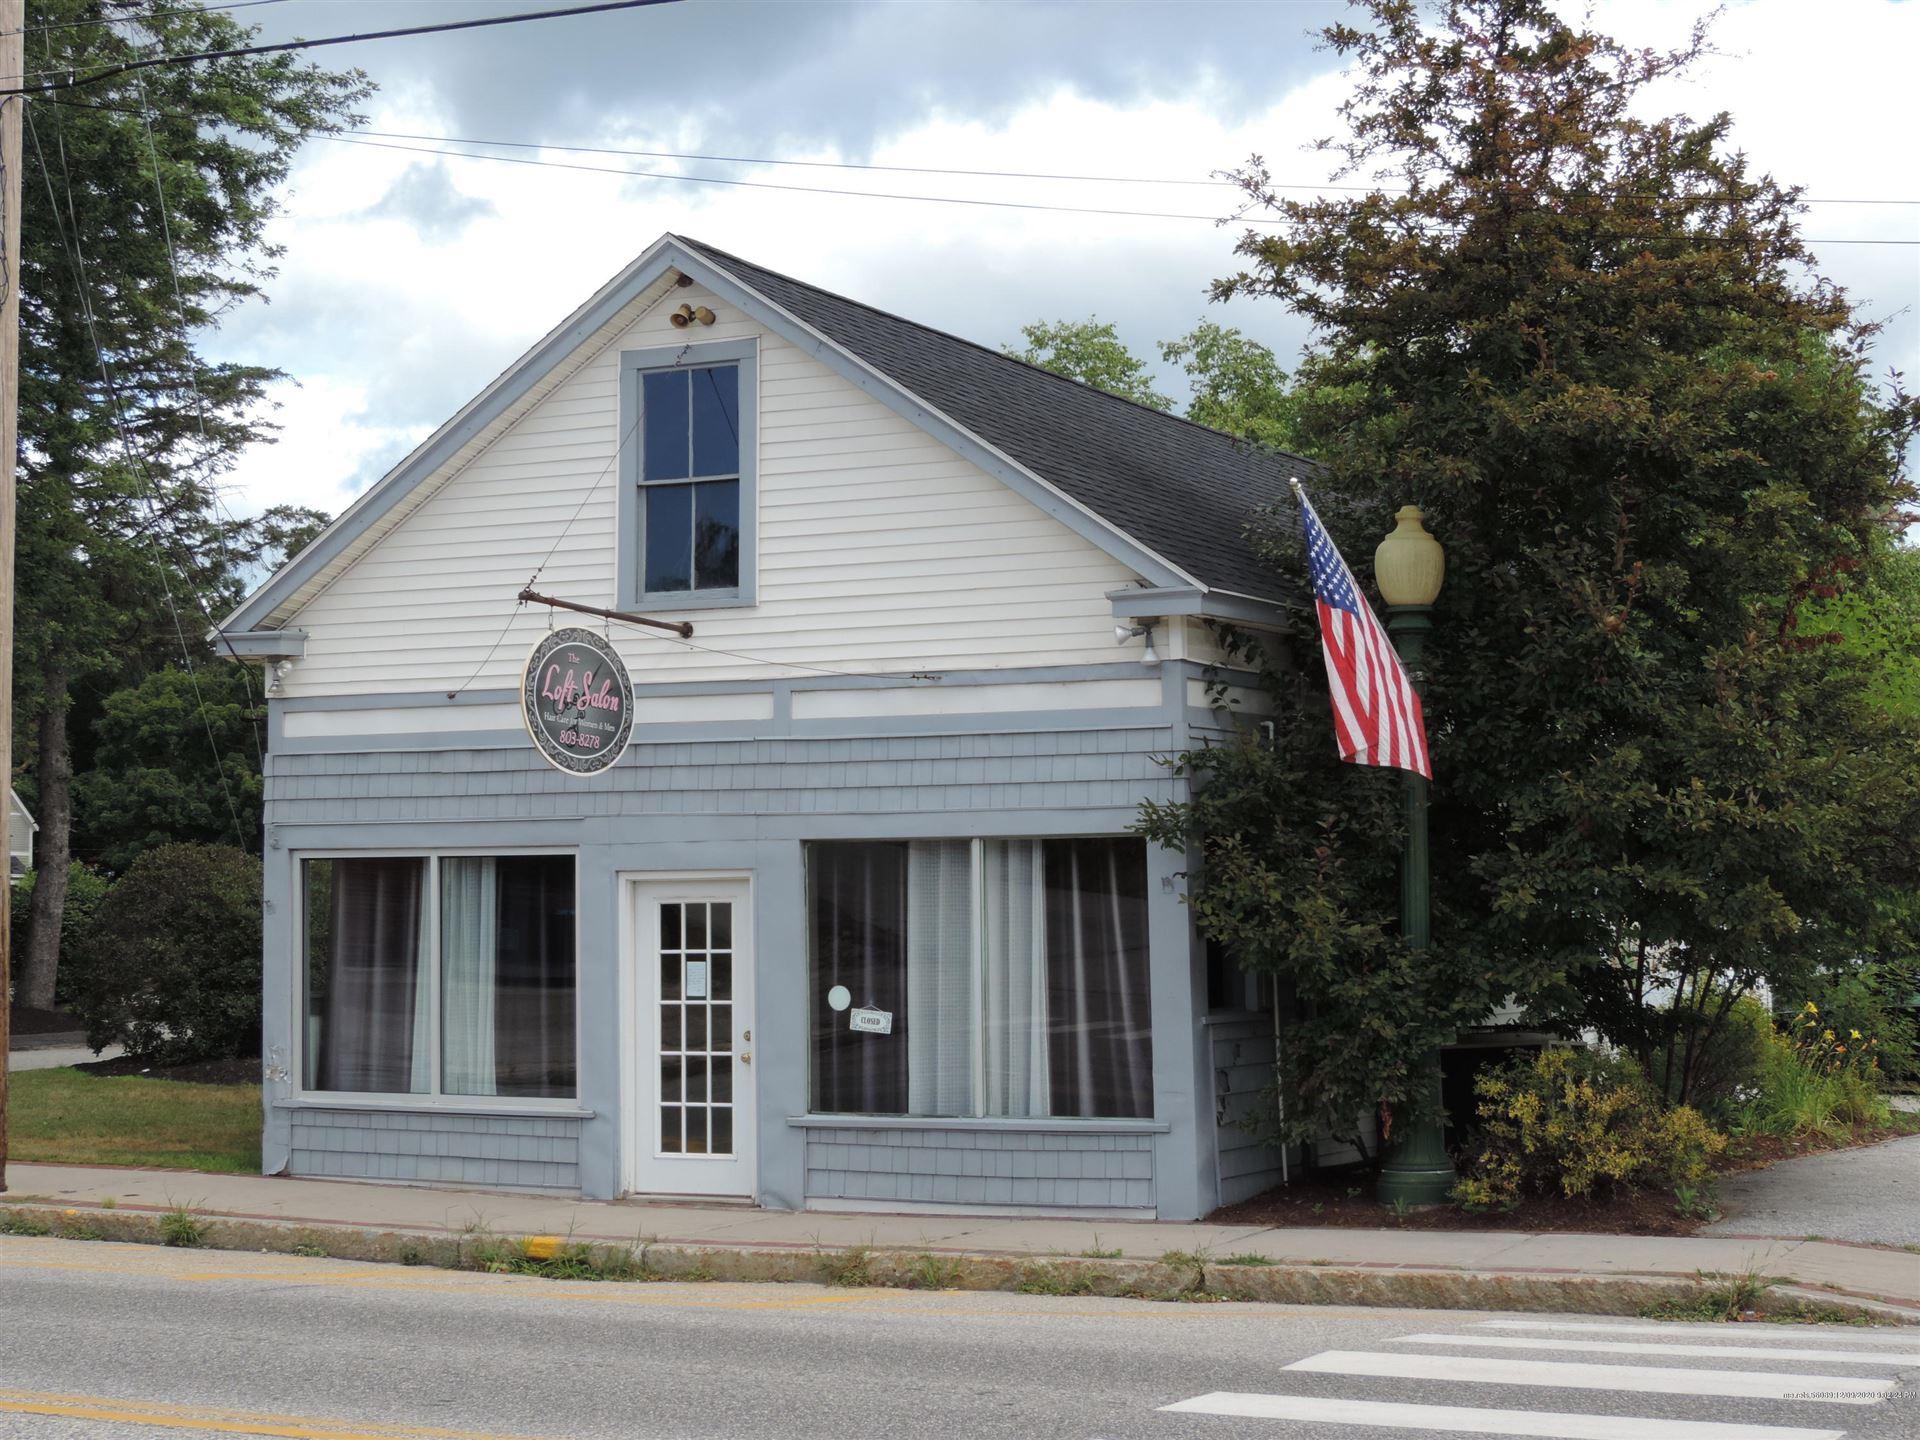 Photo of 240 Main Street, Bridgton, ME 04009 (MLS # 1443767)